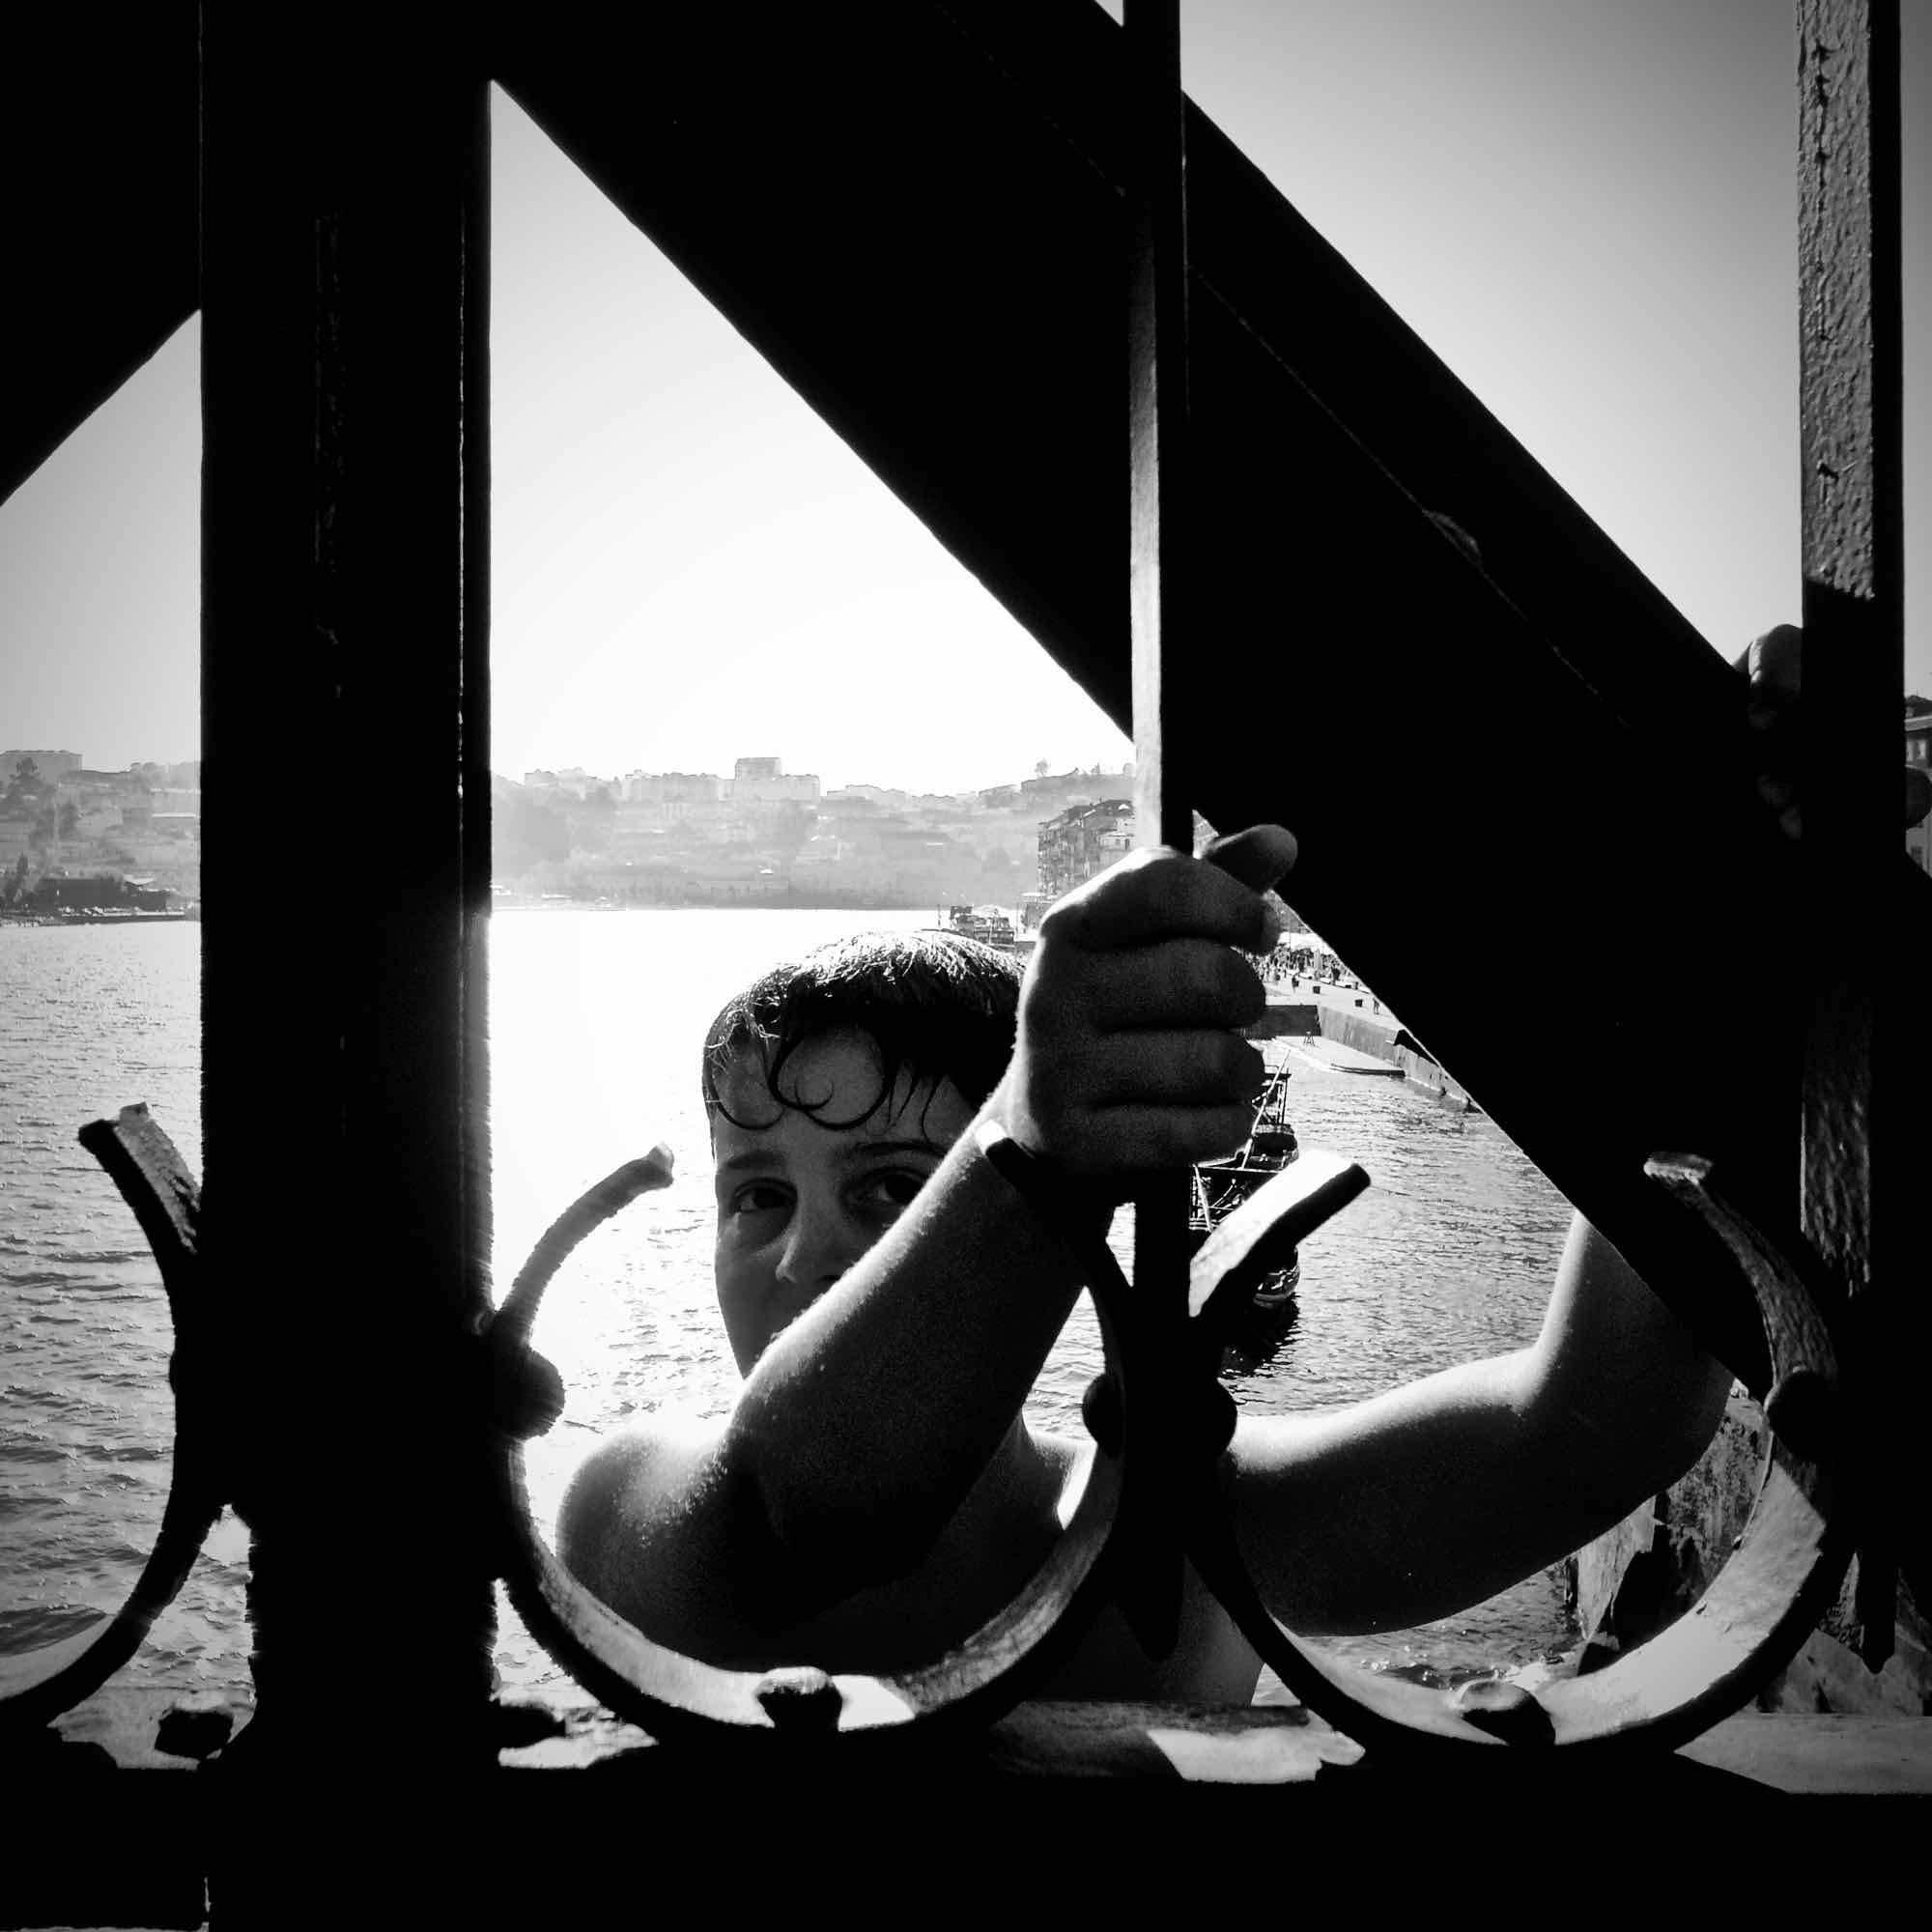 Massimiliano Scarpa photography